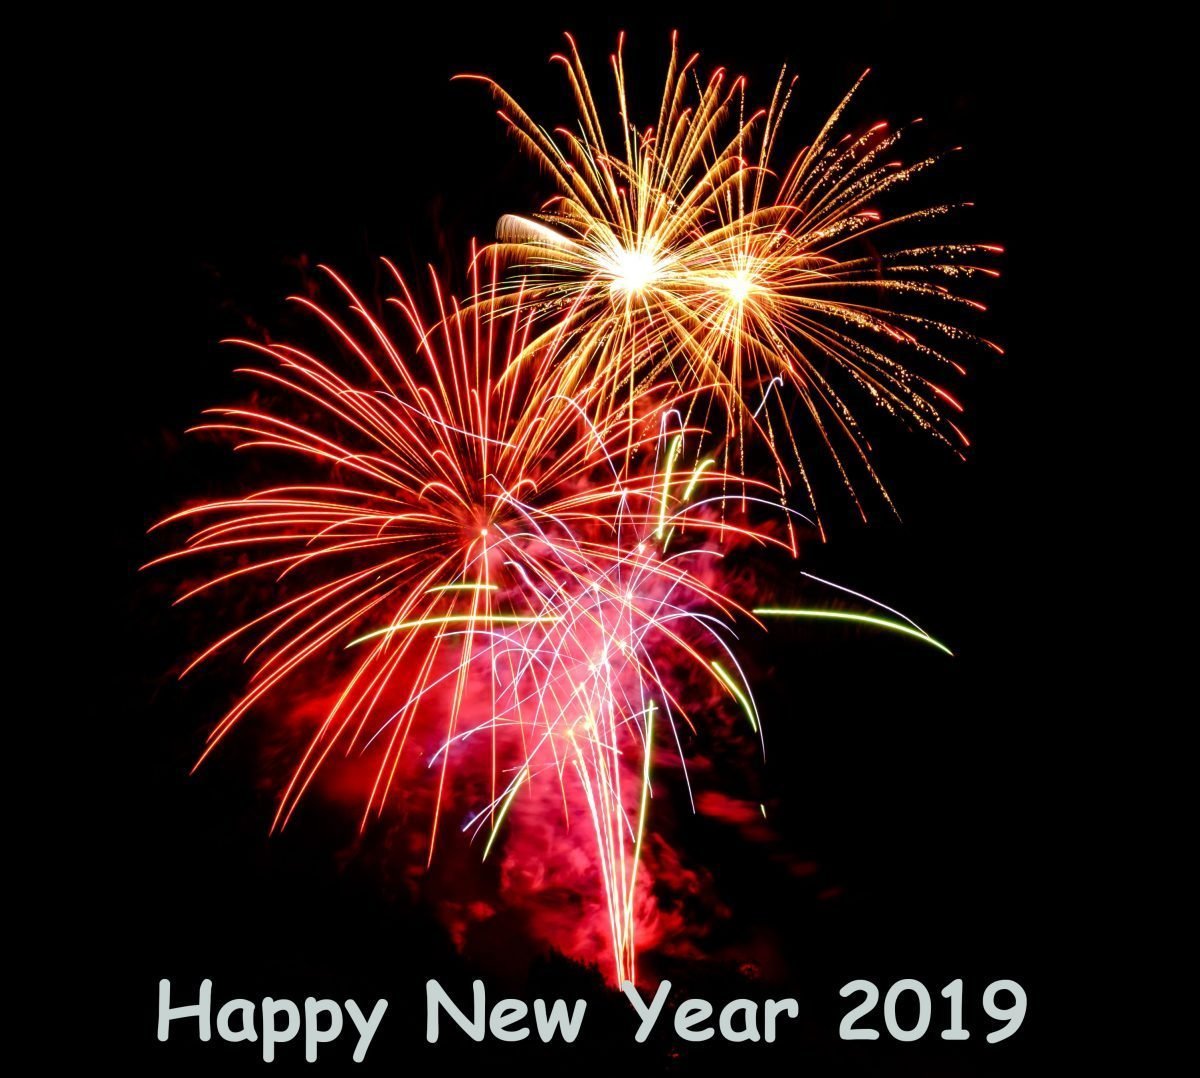 Happy New Year 2019 - Jaipur stuff and news